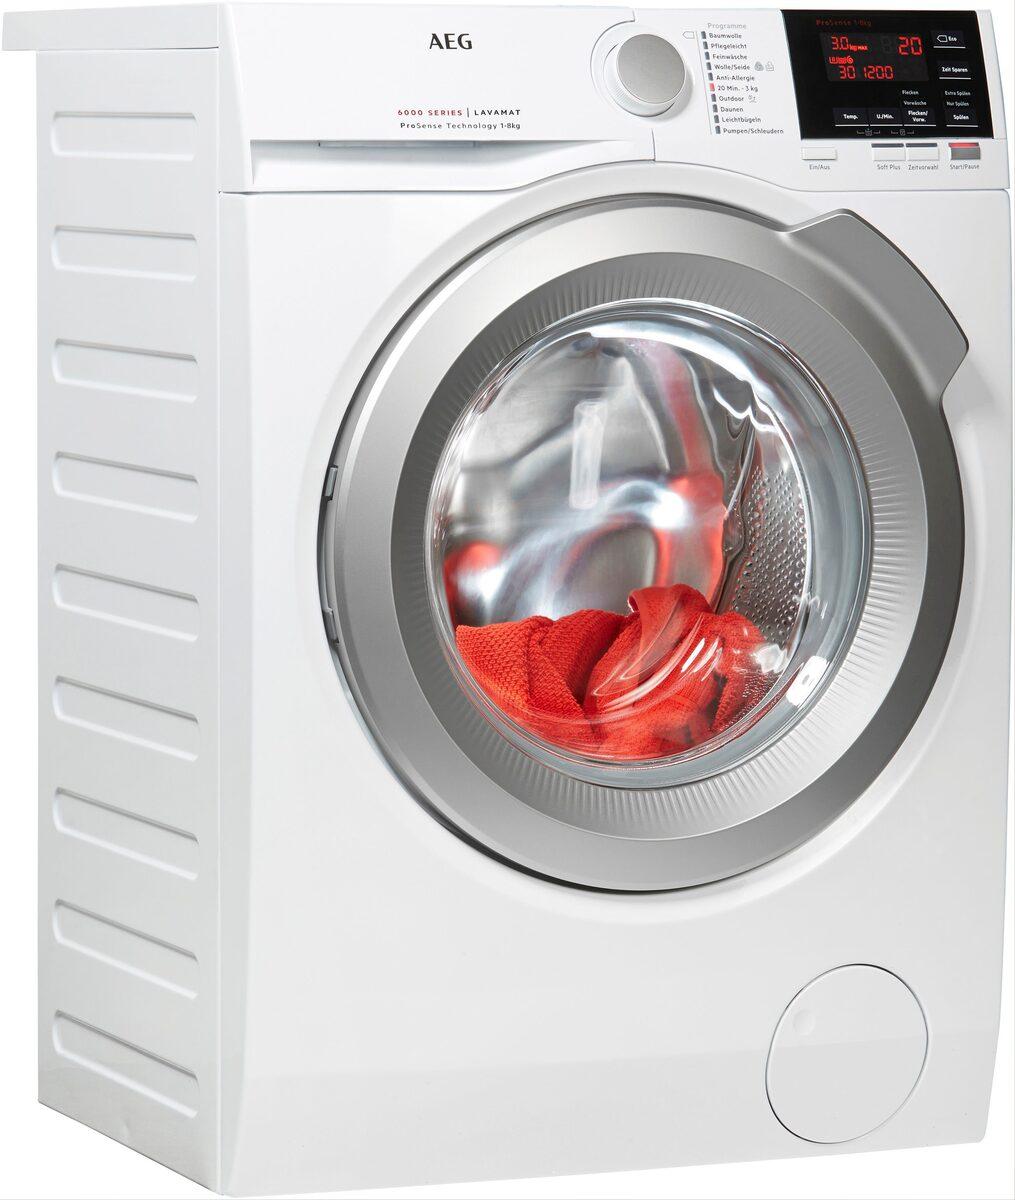 Bild 1 von AEG Waschmaschine 6000 L6FBA68, 8 kg, 1600 U/Min, ProSense - Mengenautomatik